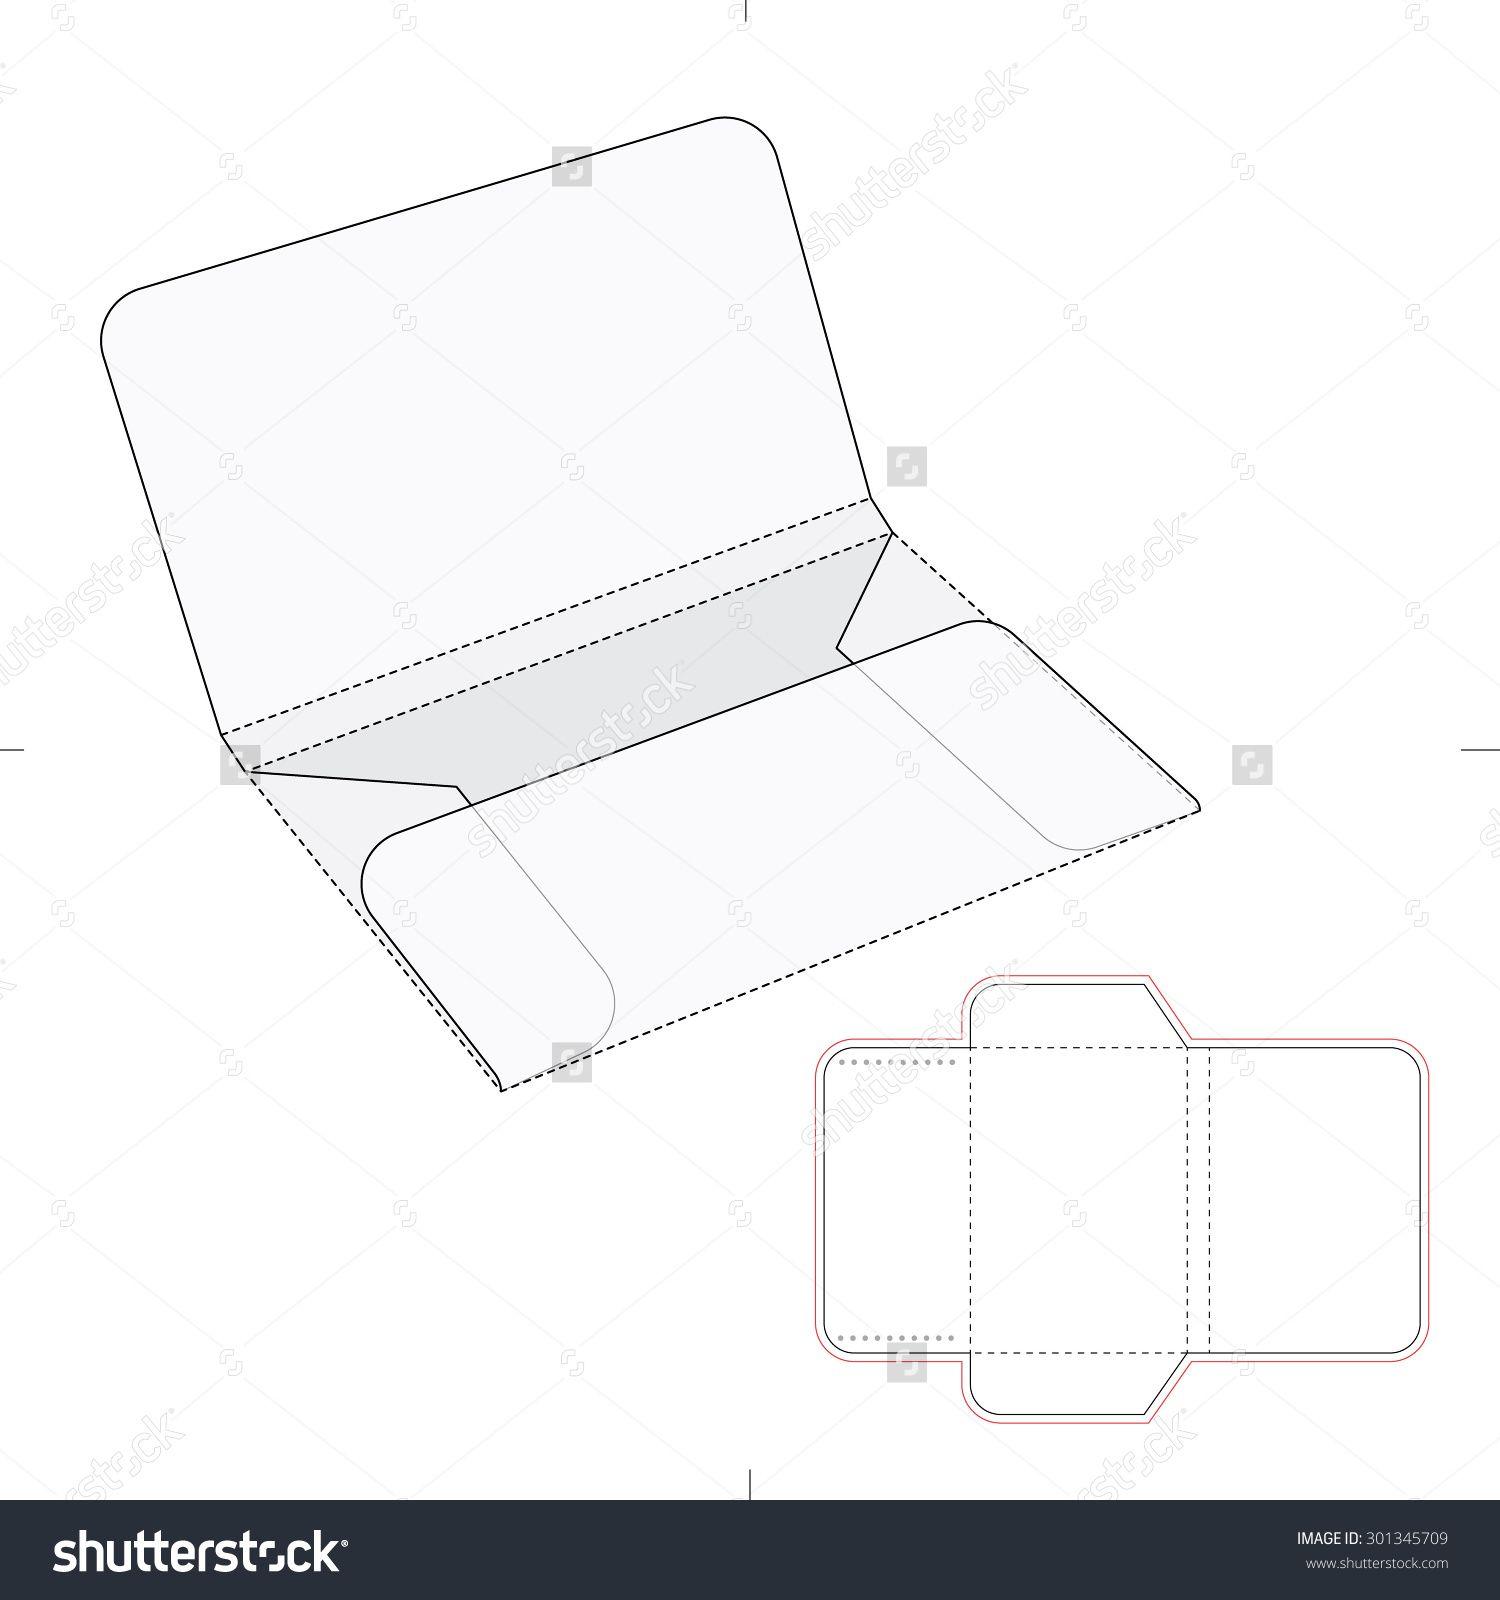 Envelope folder with blueprint template stock vector illustration envelope folder with blueprint template stock vector illustration 301345709 shutterstock malvernweather Images